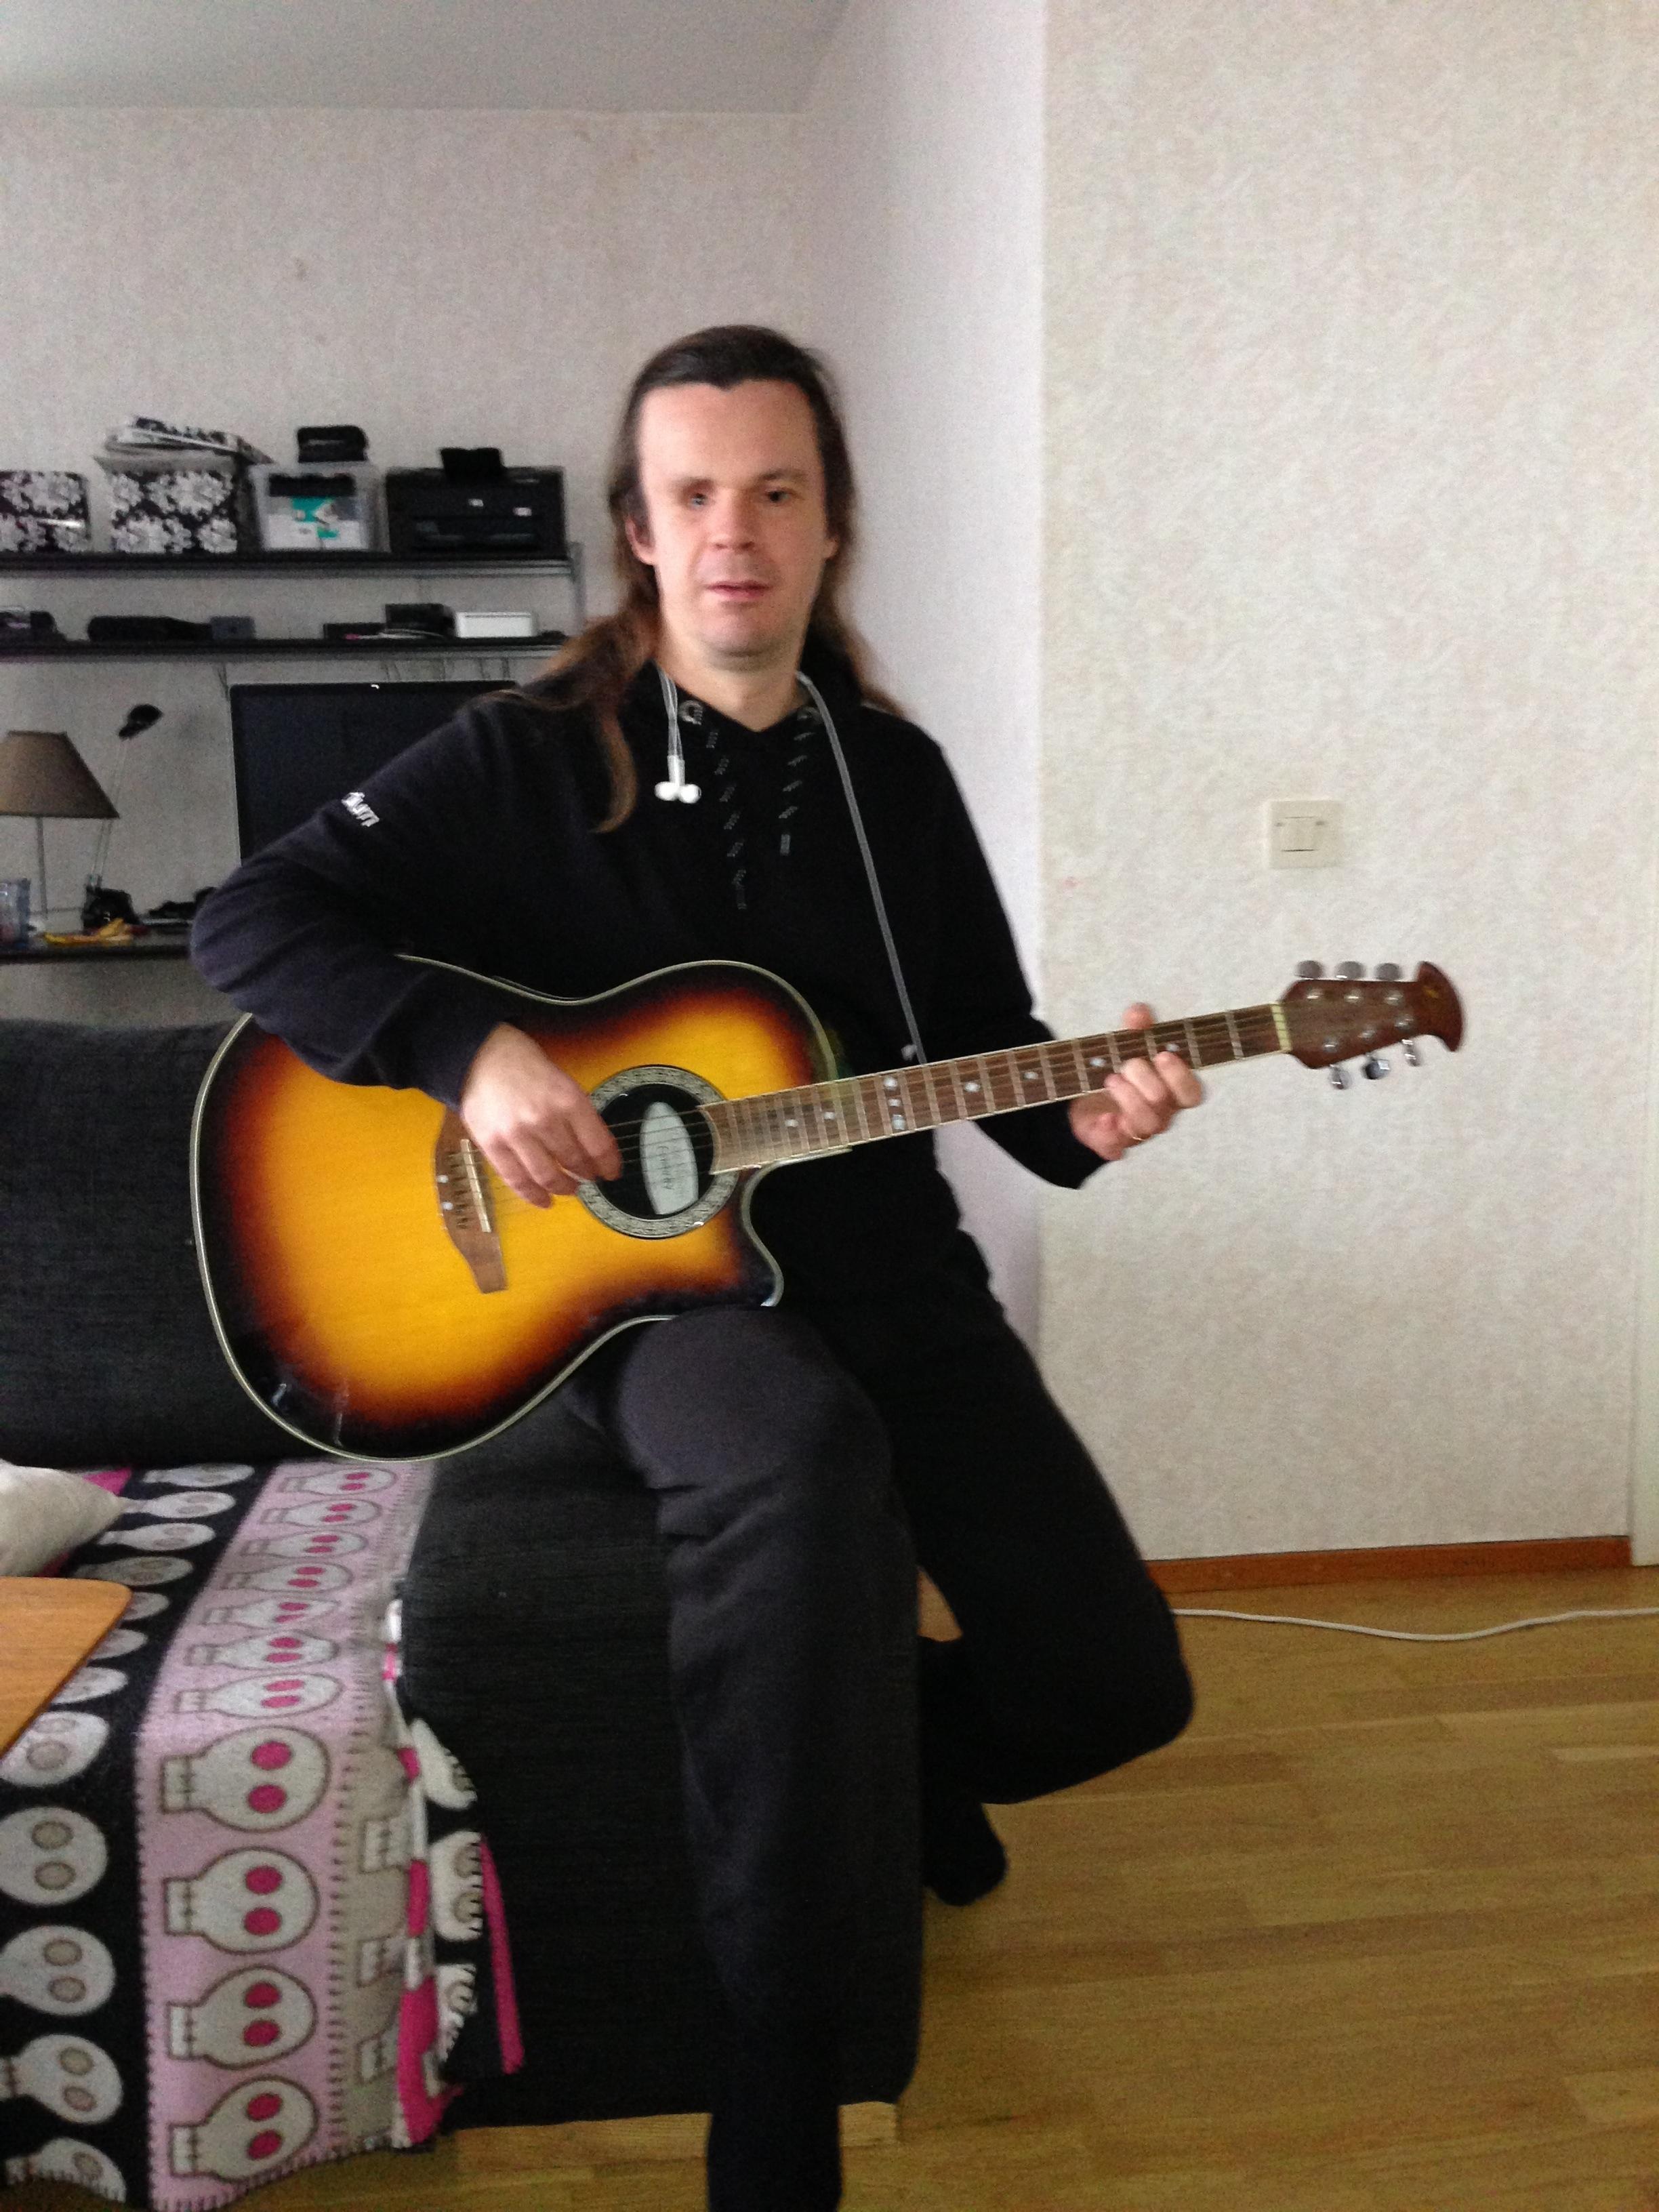 Bild: Joakim Nömell spelar gitarr